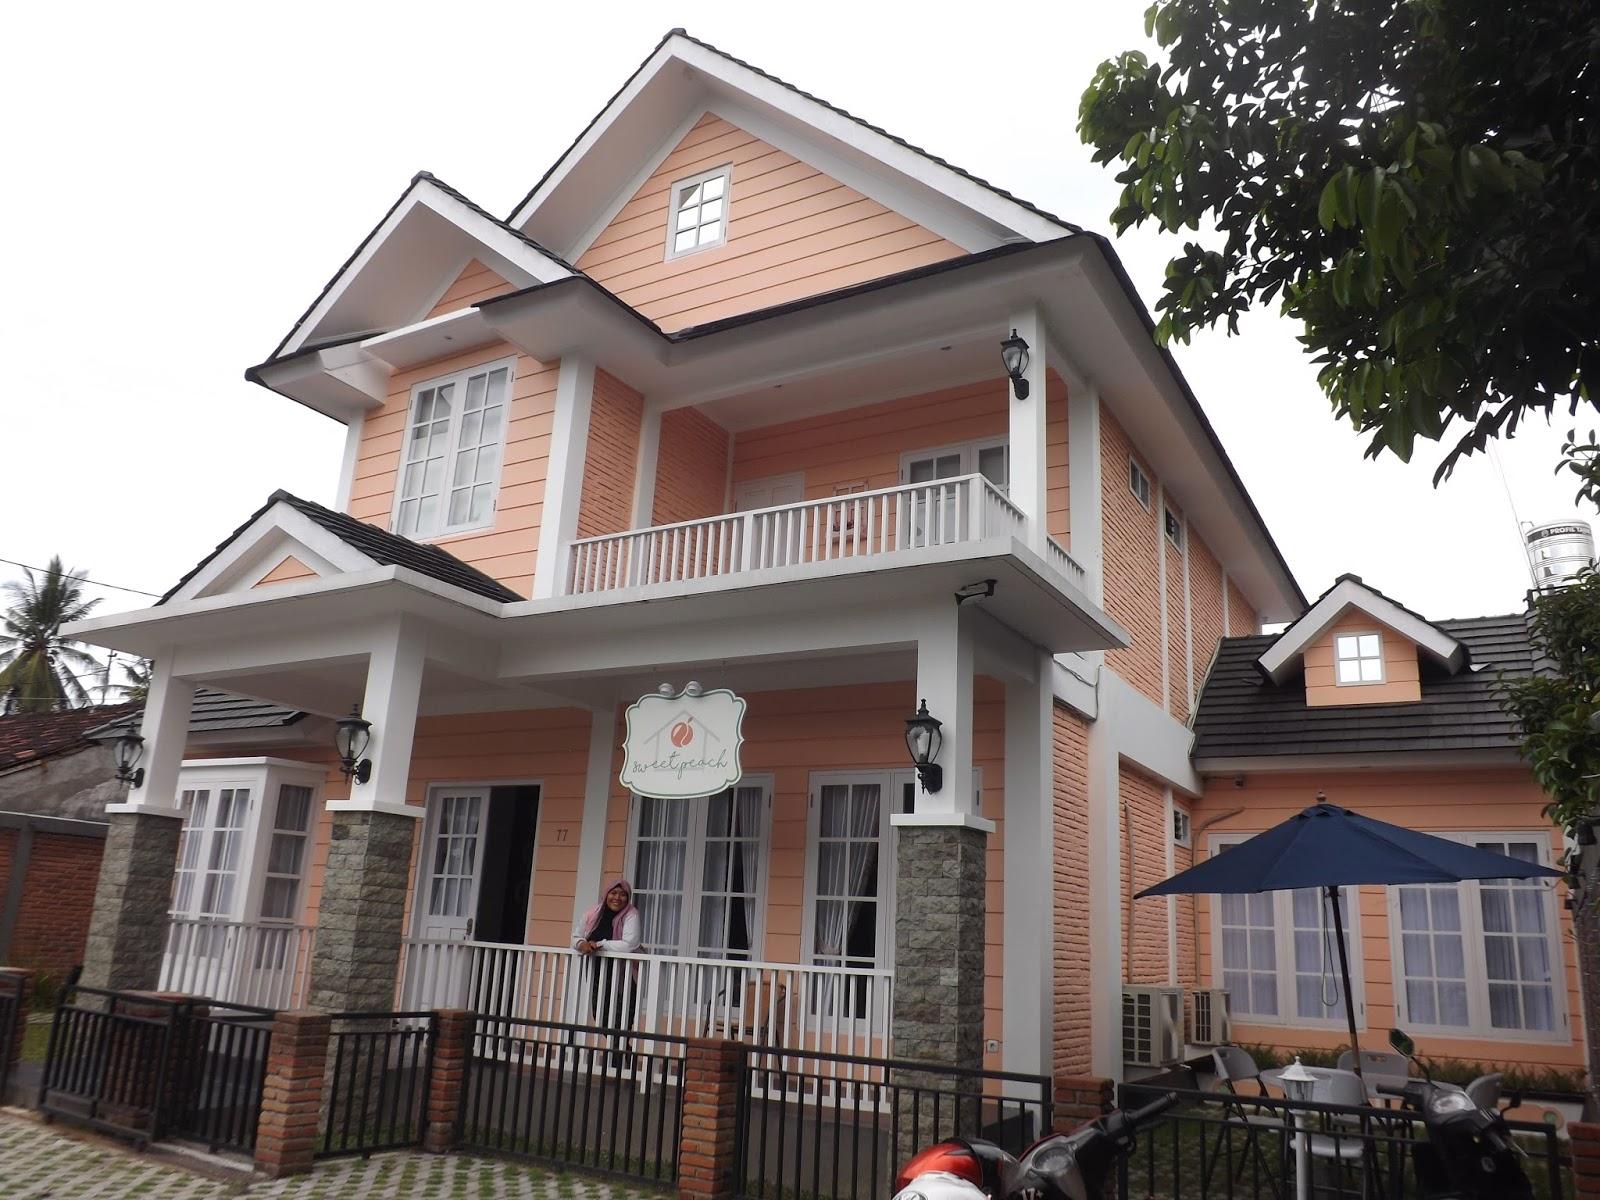 9 Unforgettable 5 Star Hotels in Yogya from $78